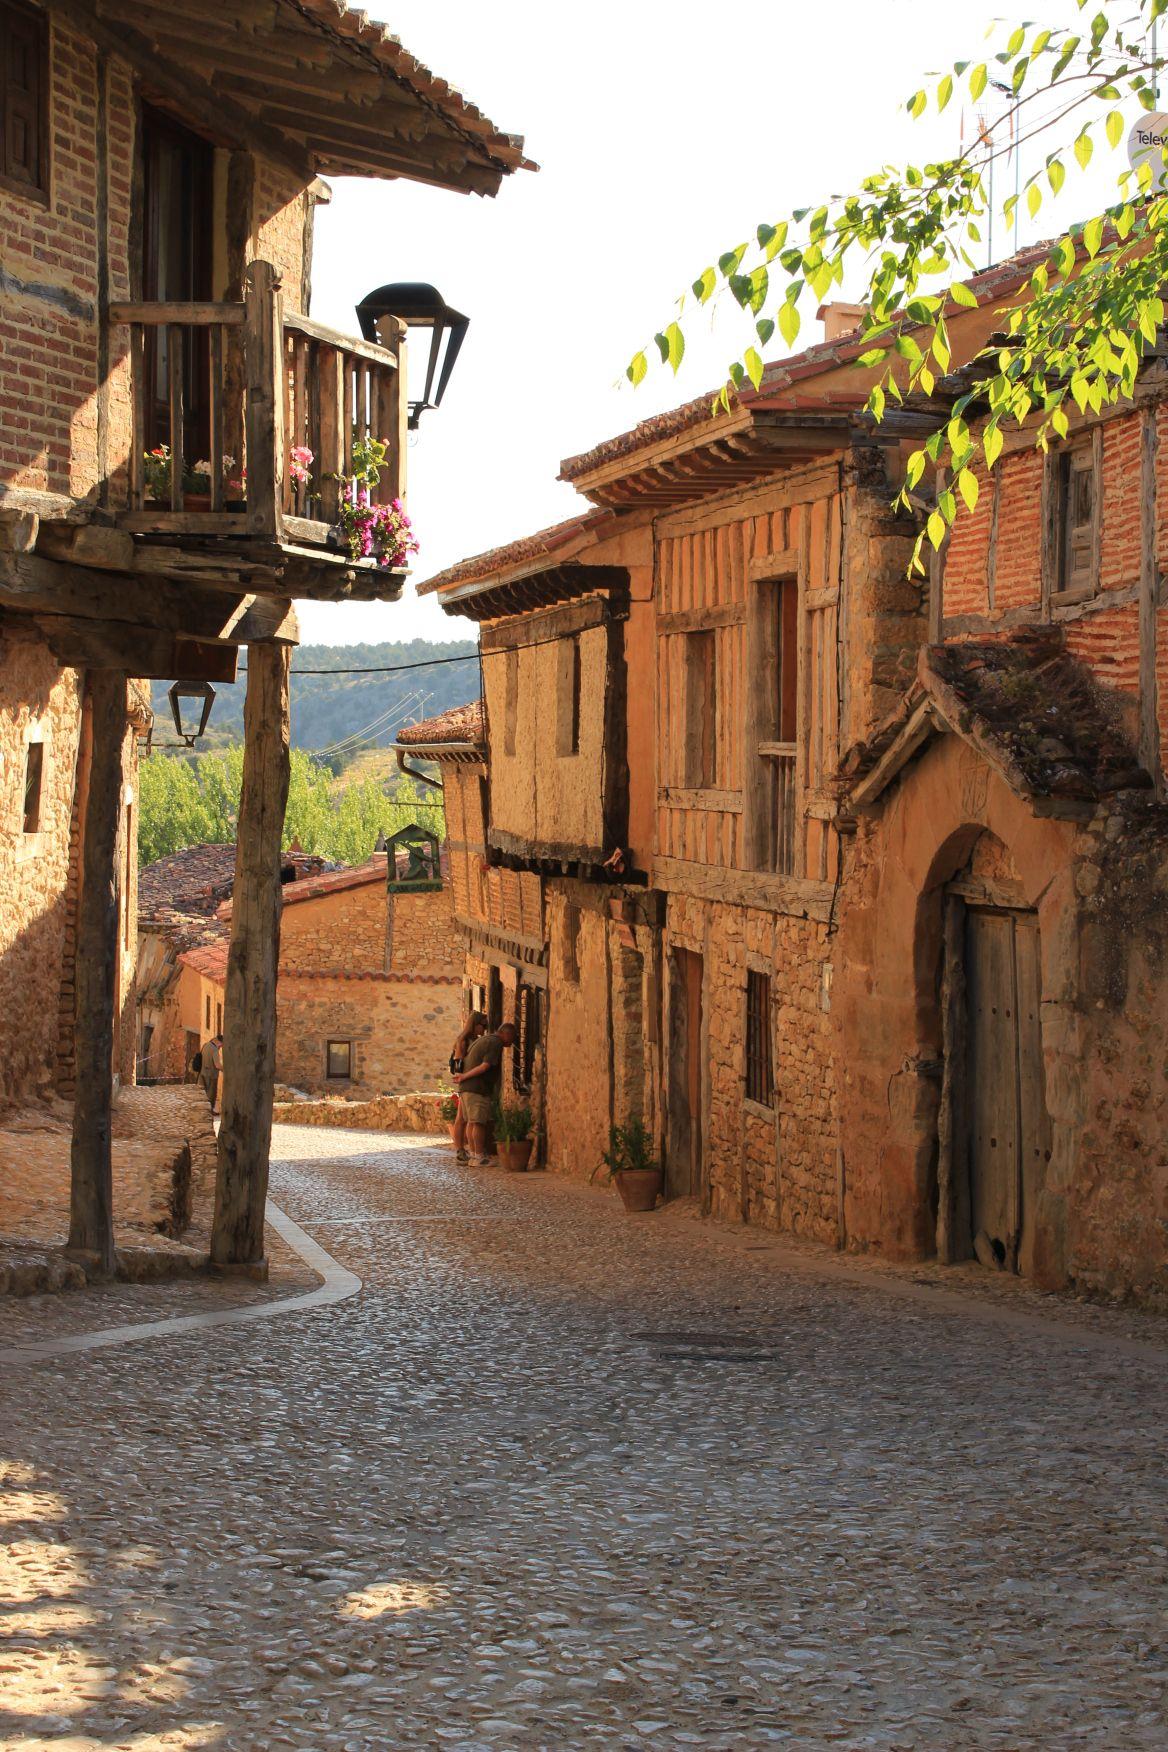 Calata azor soria viajes en 2019 espa a soria for Lugares turisticos para visitar en espana